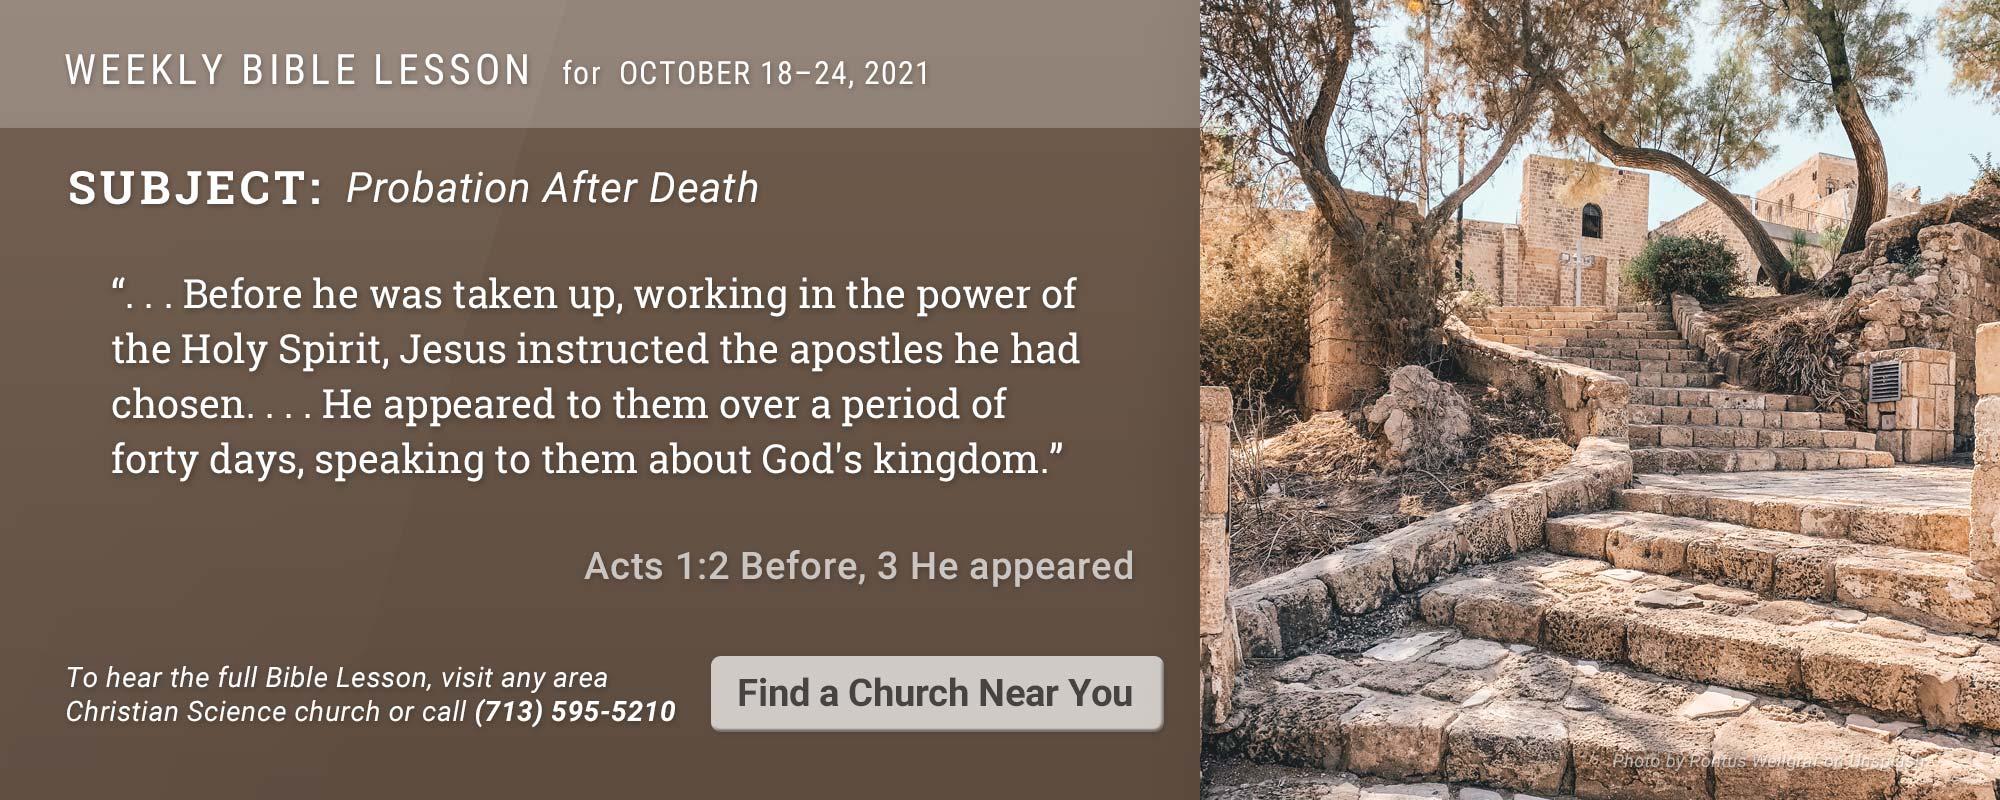 Bible Lesson Golden Text 20211018